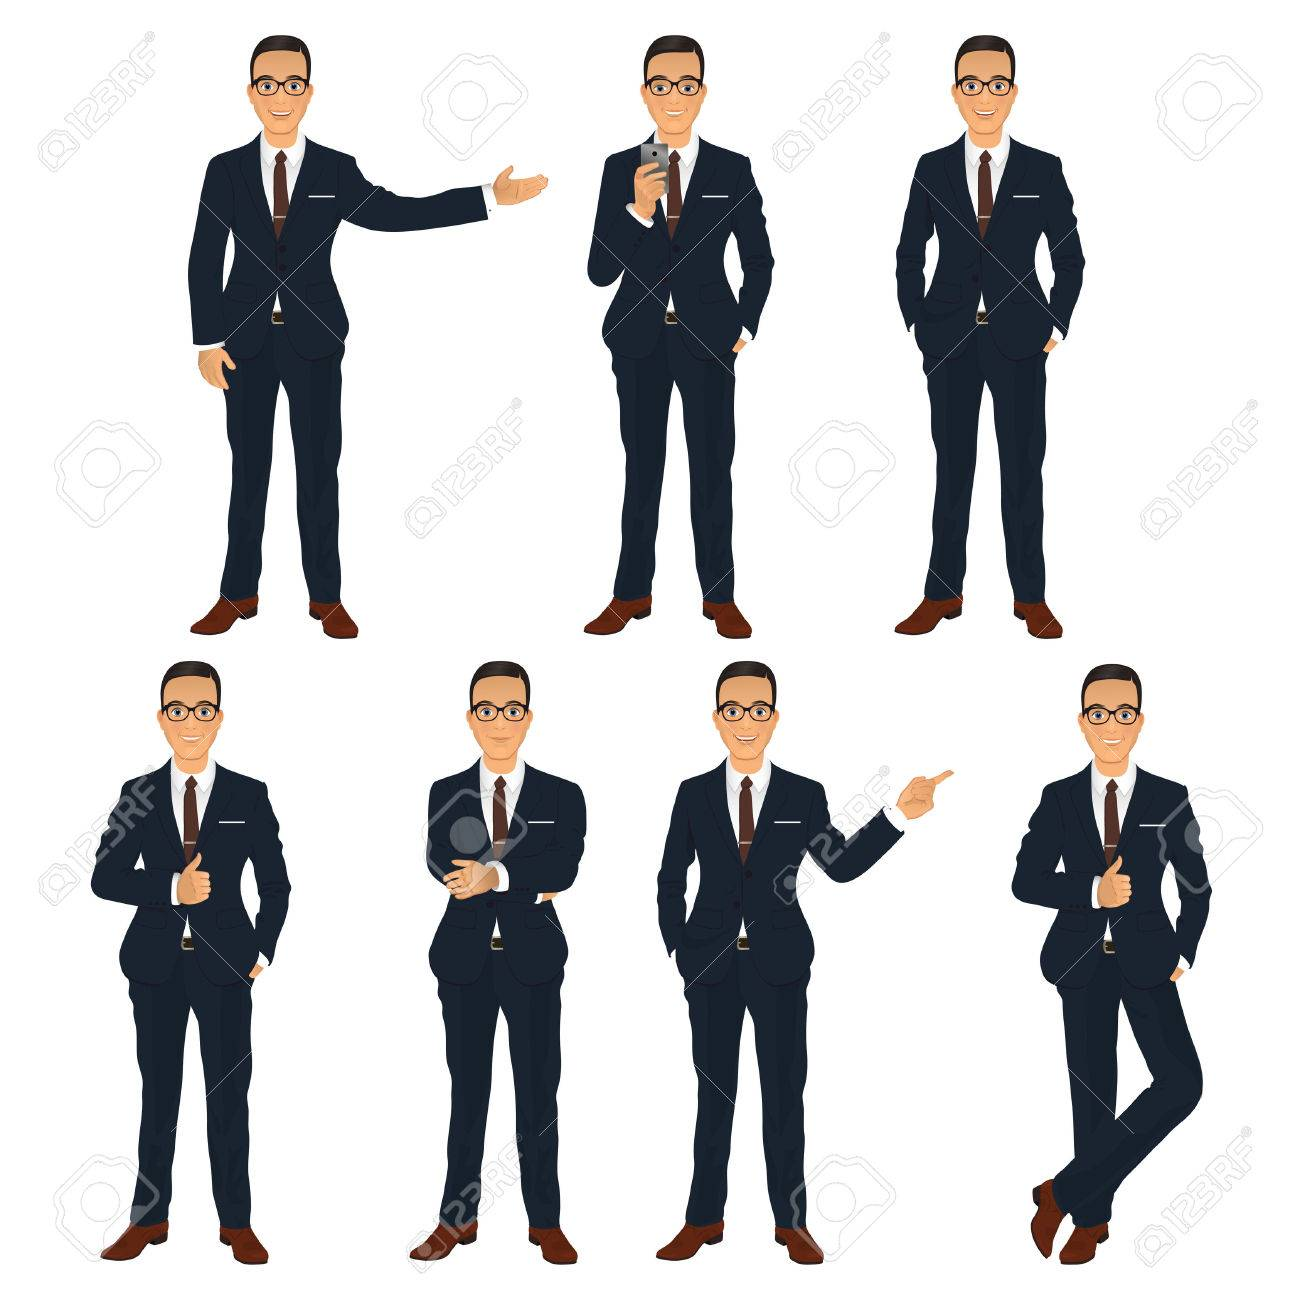 Businessman - 56646990